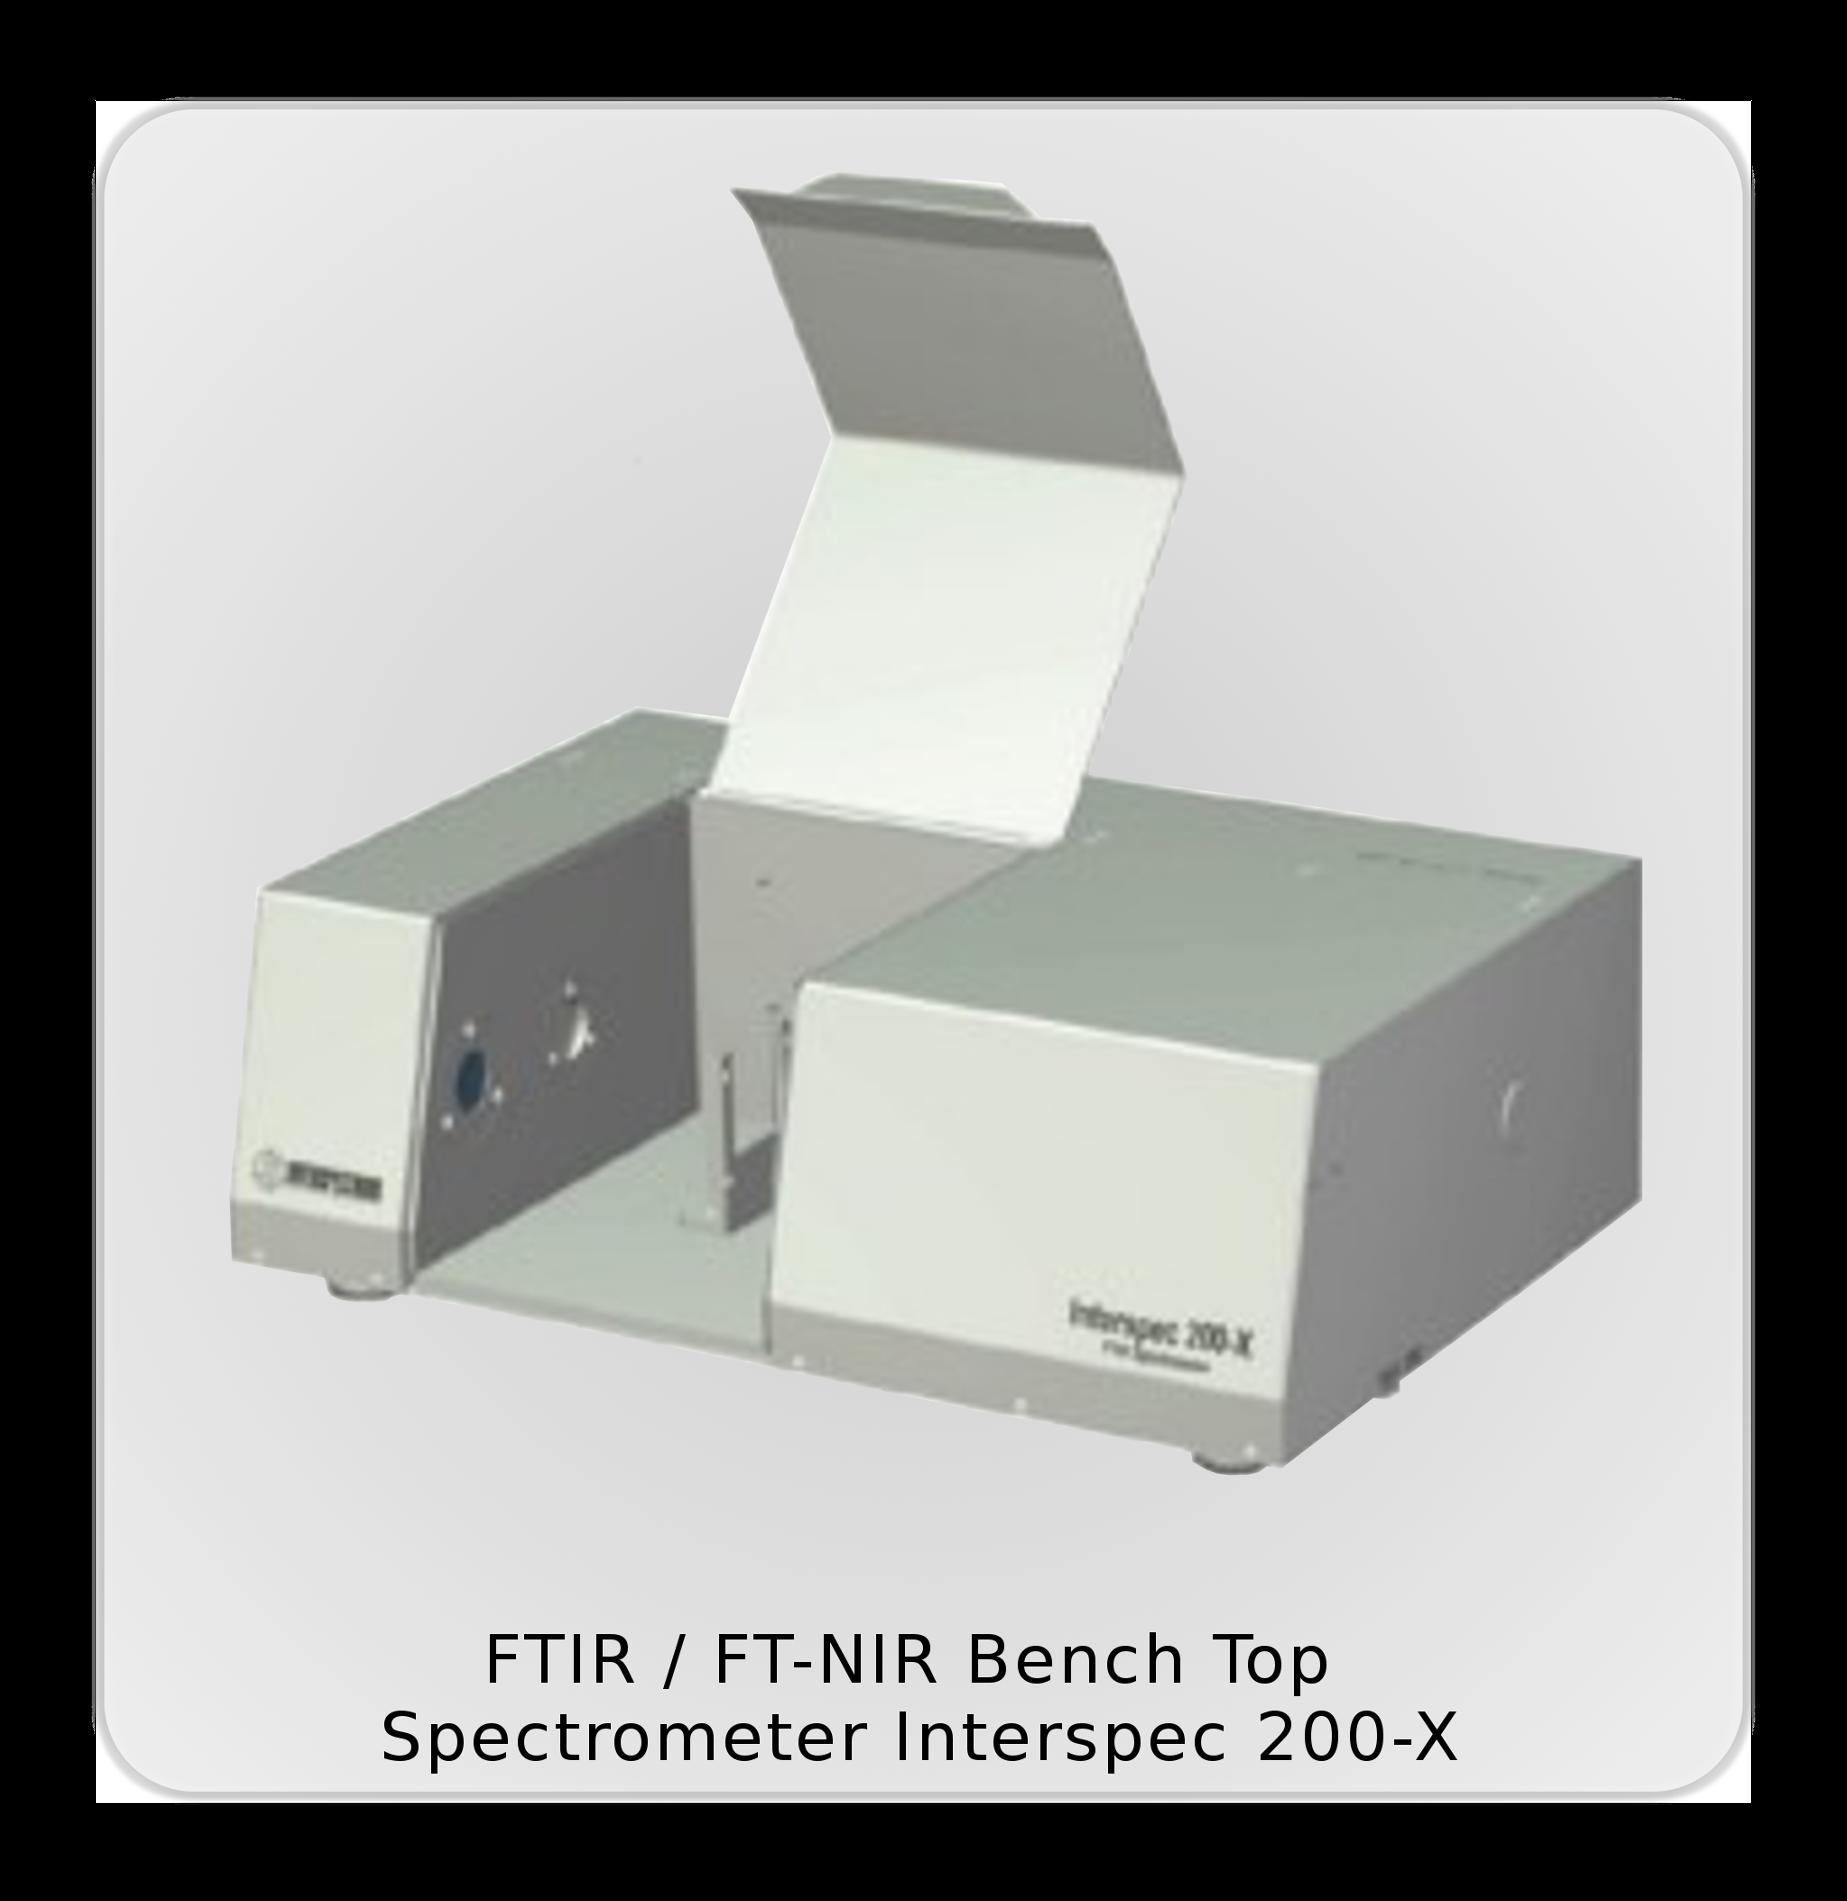 ftir-ft-nir-bench-top-spectrometer-interspec-200-x